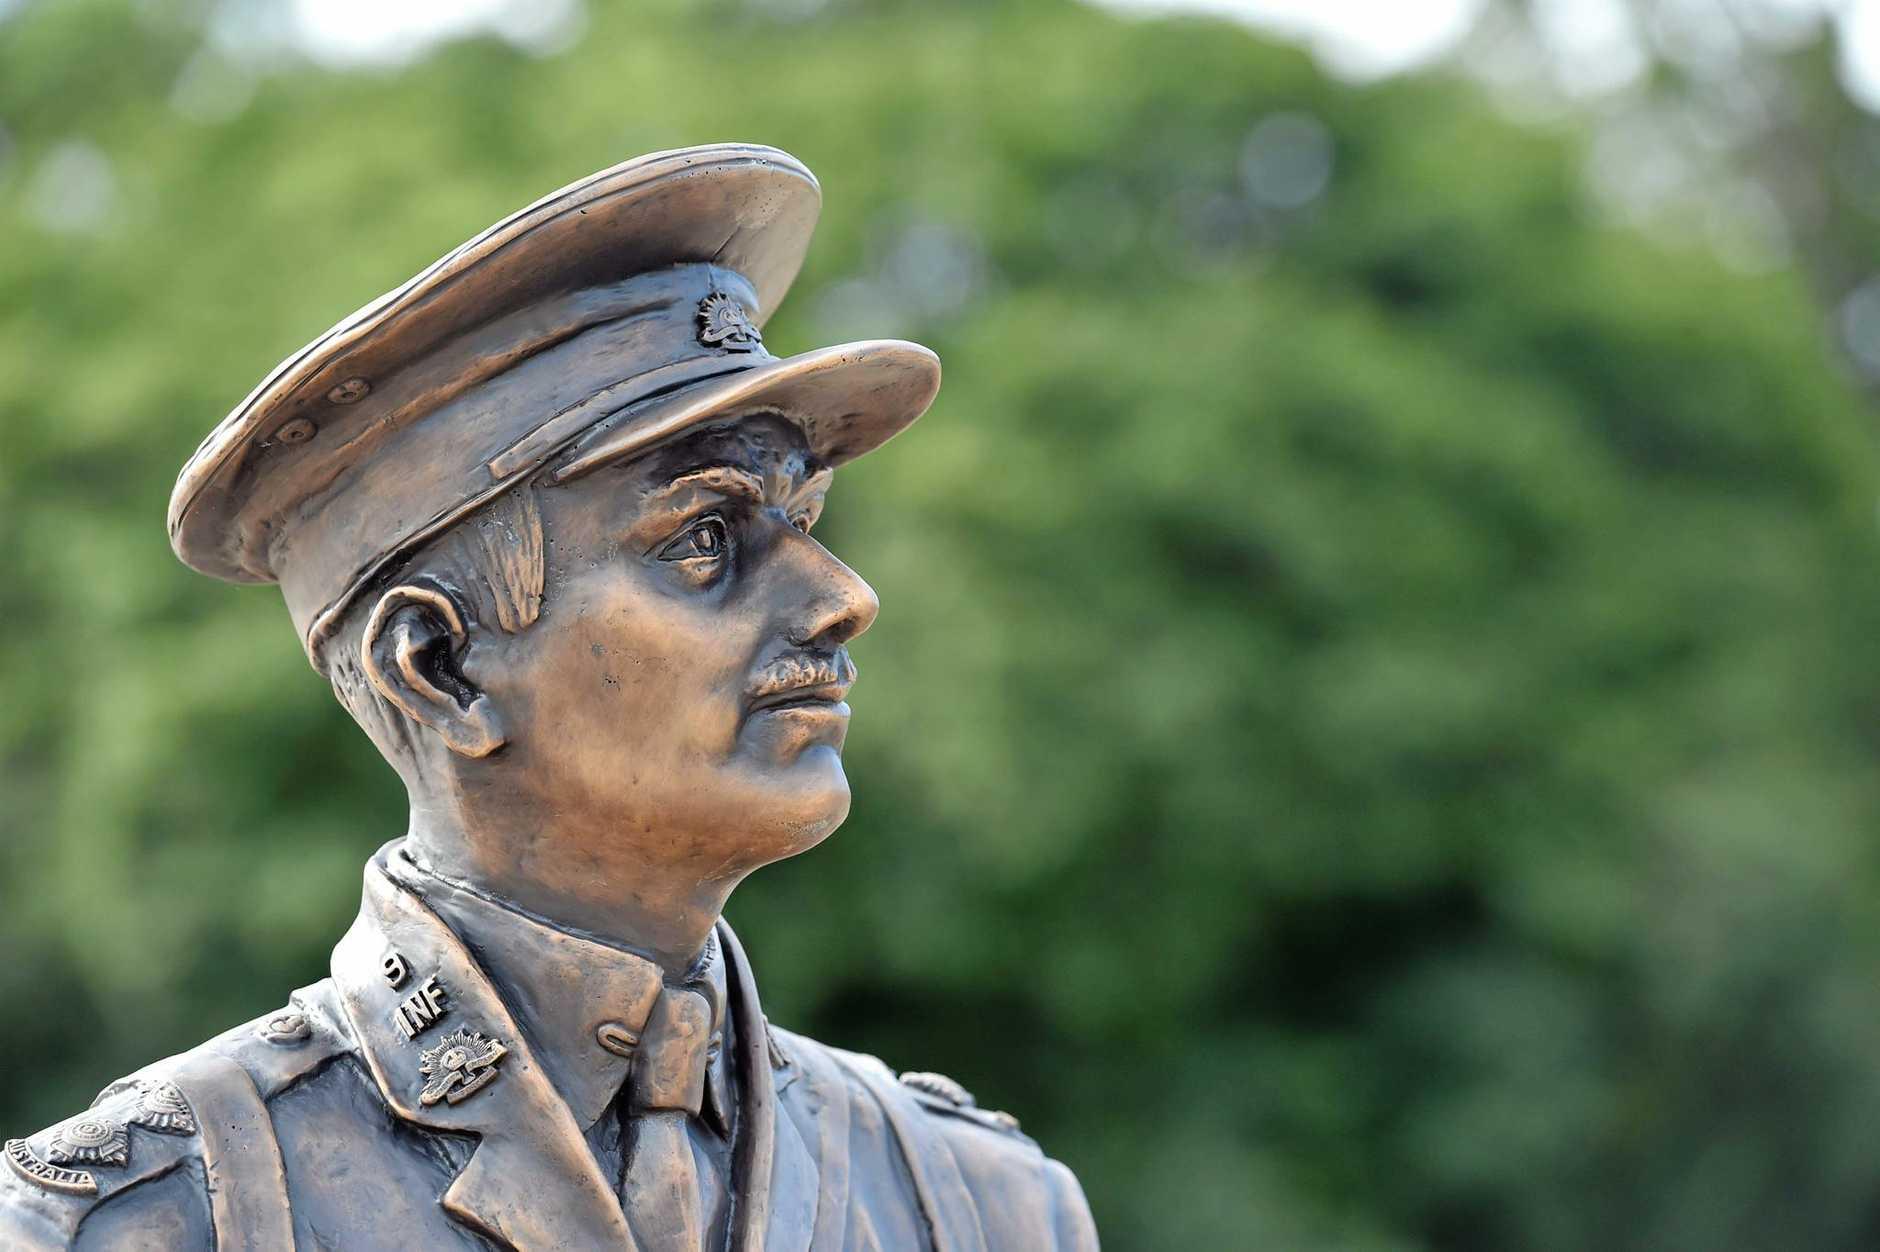 Duncan Chapman statue in Maryborough. Photo: Alistair Brightman / Fraser Coast Chronicle